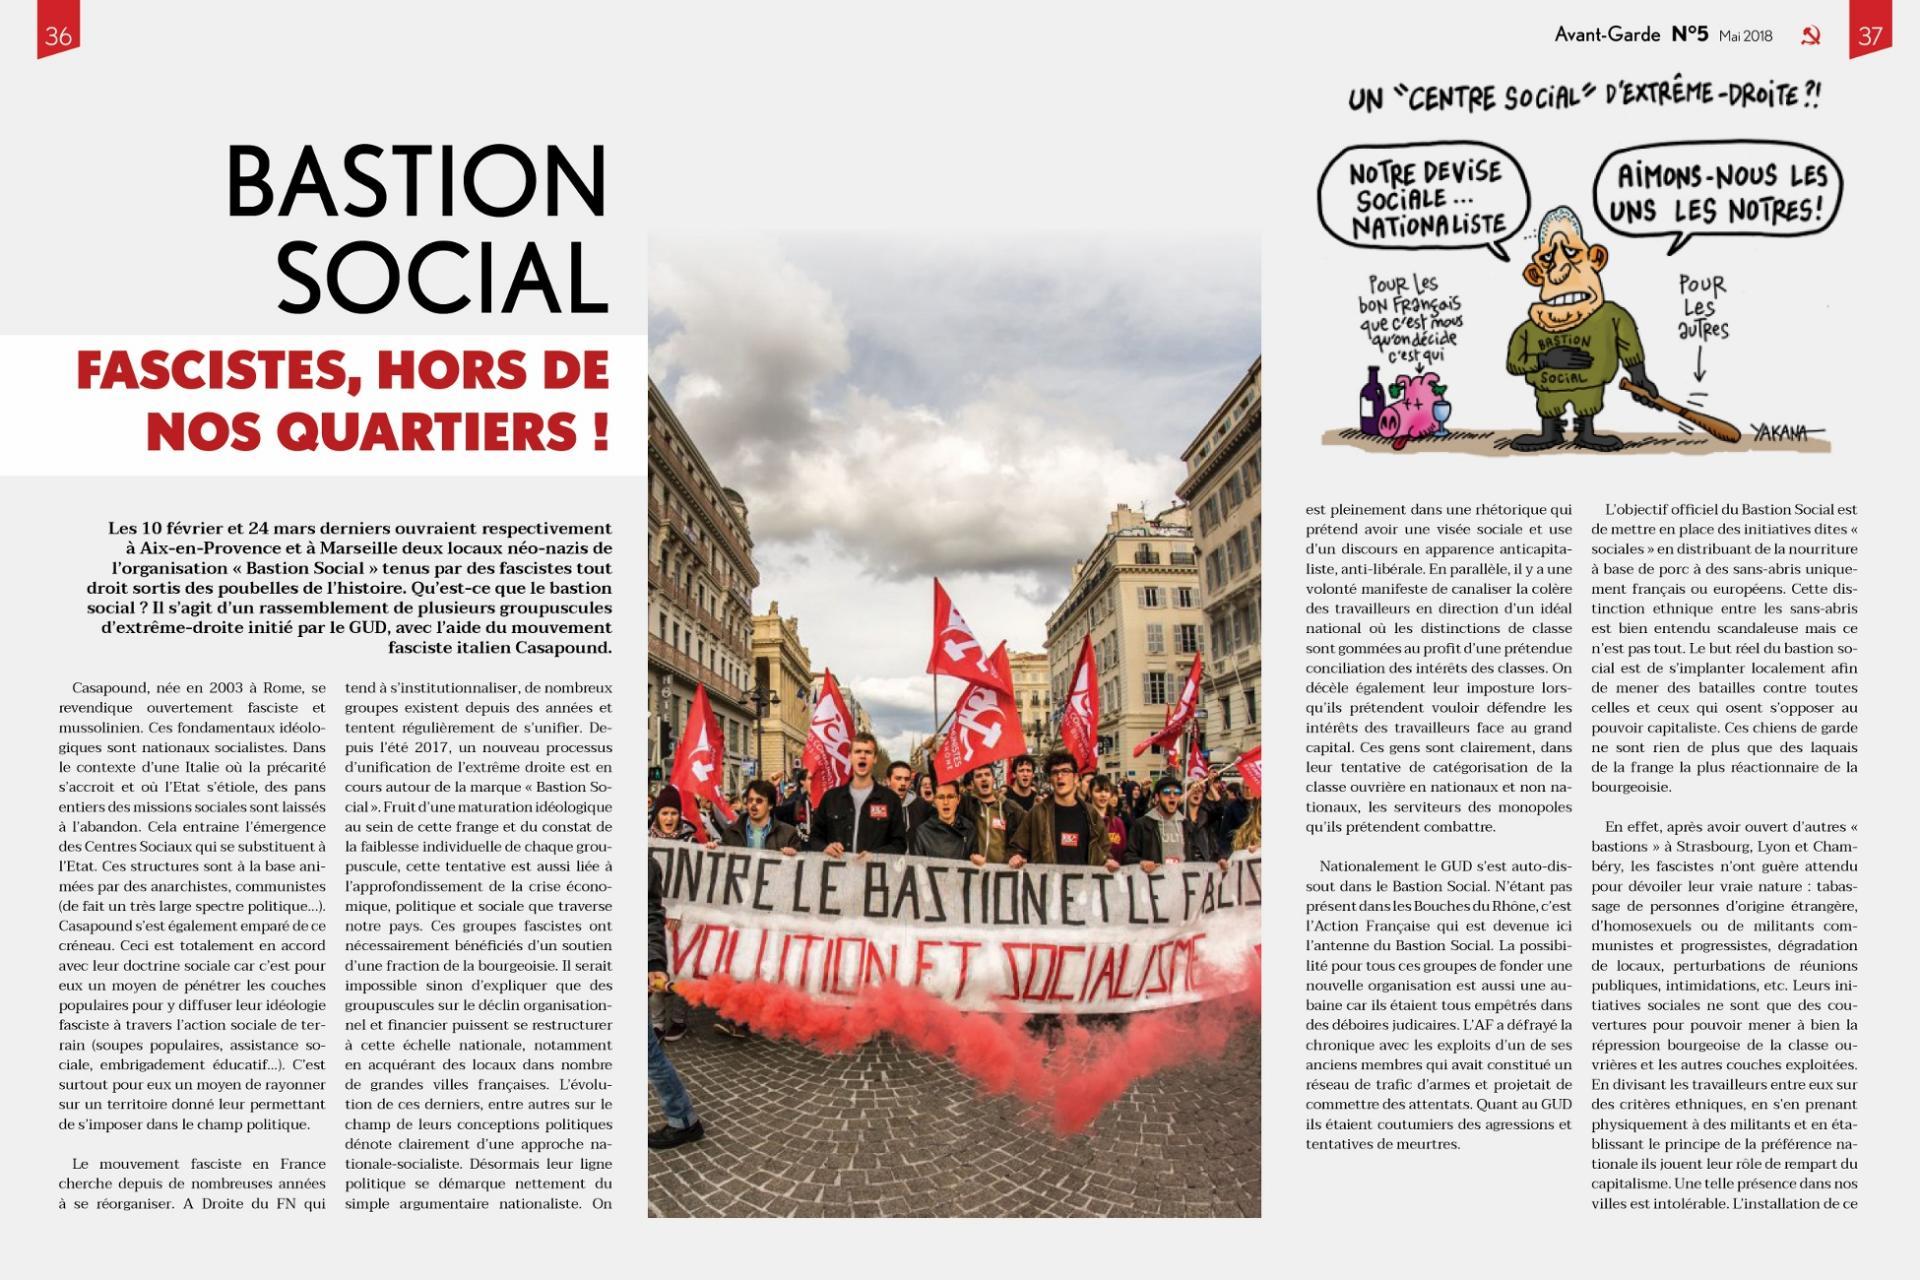 Avant-Garde Mai 2018 - 36